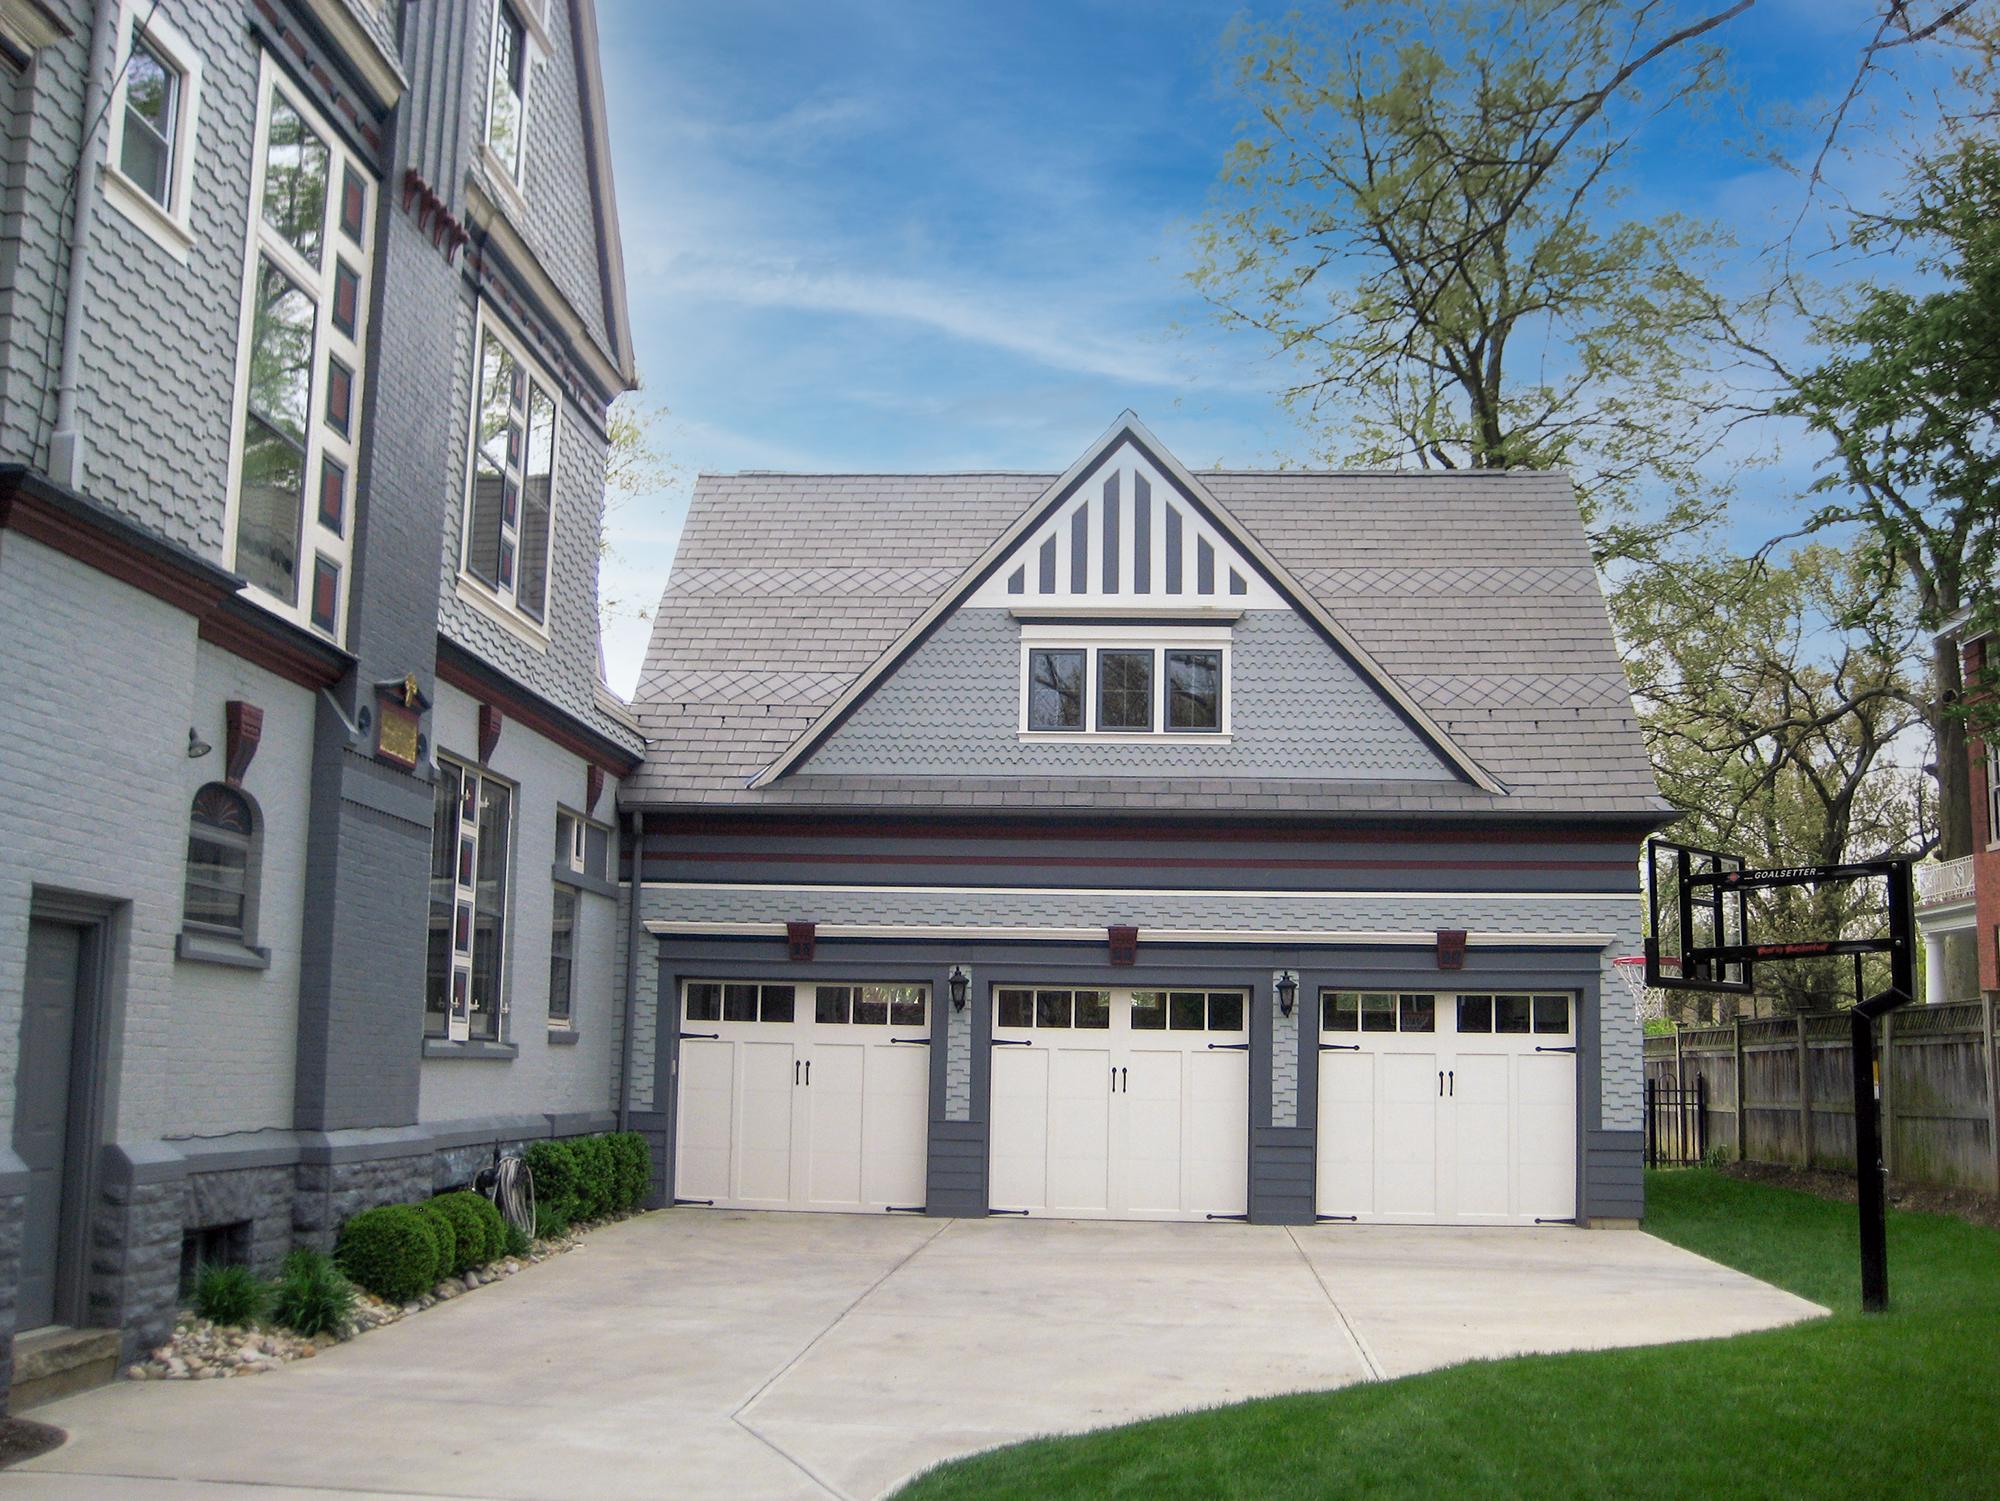 3-car garage residential architecture Wilcox Architecture